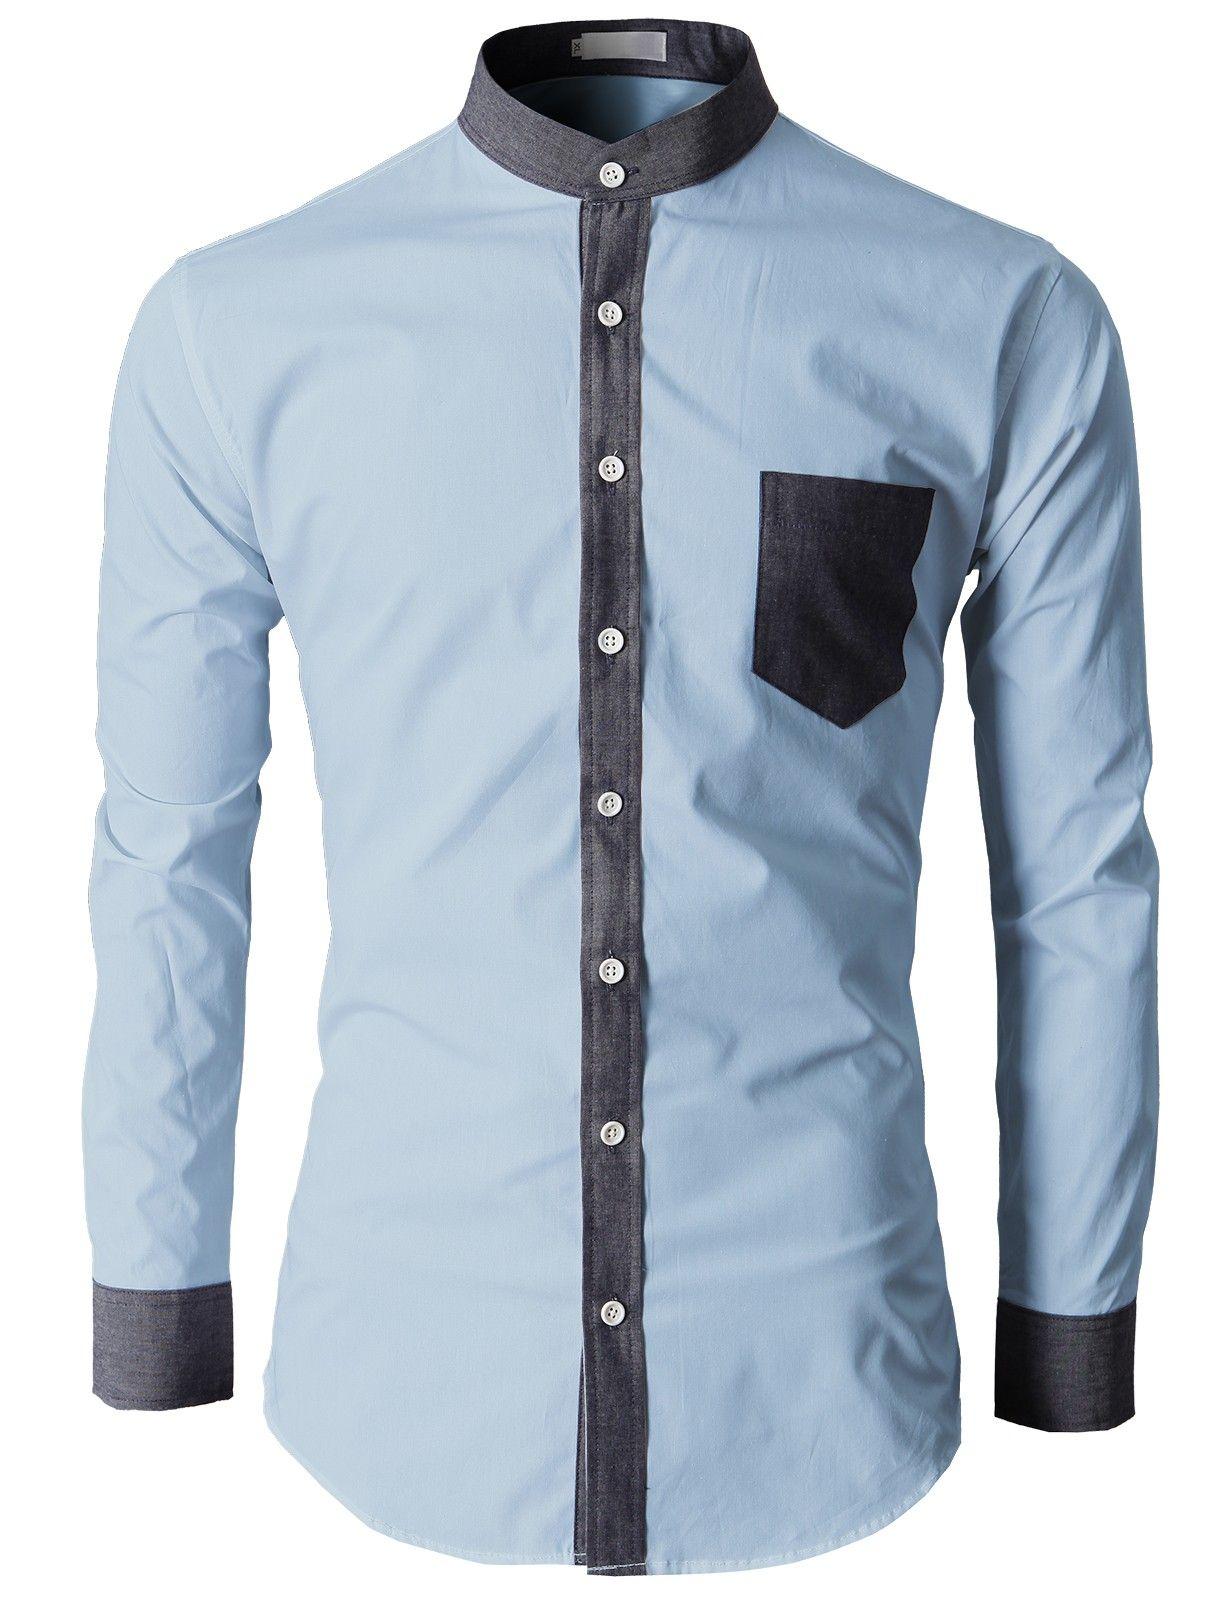 $30.99 Doublju Men's Button Down Shirts With Color Combination ...